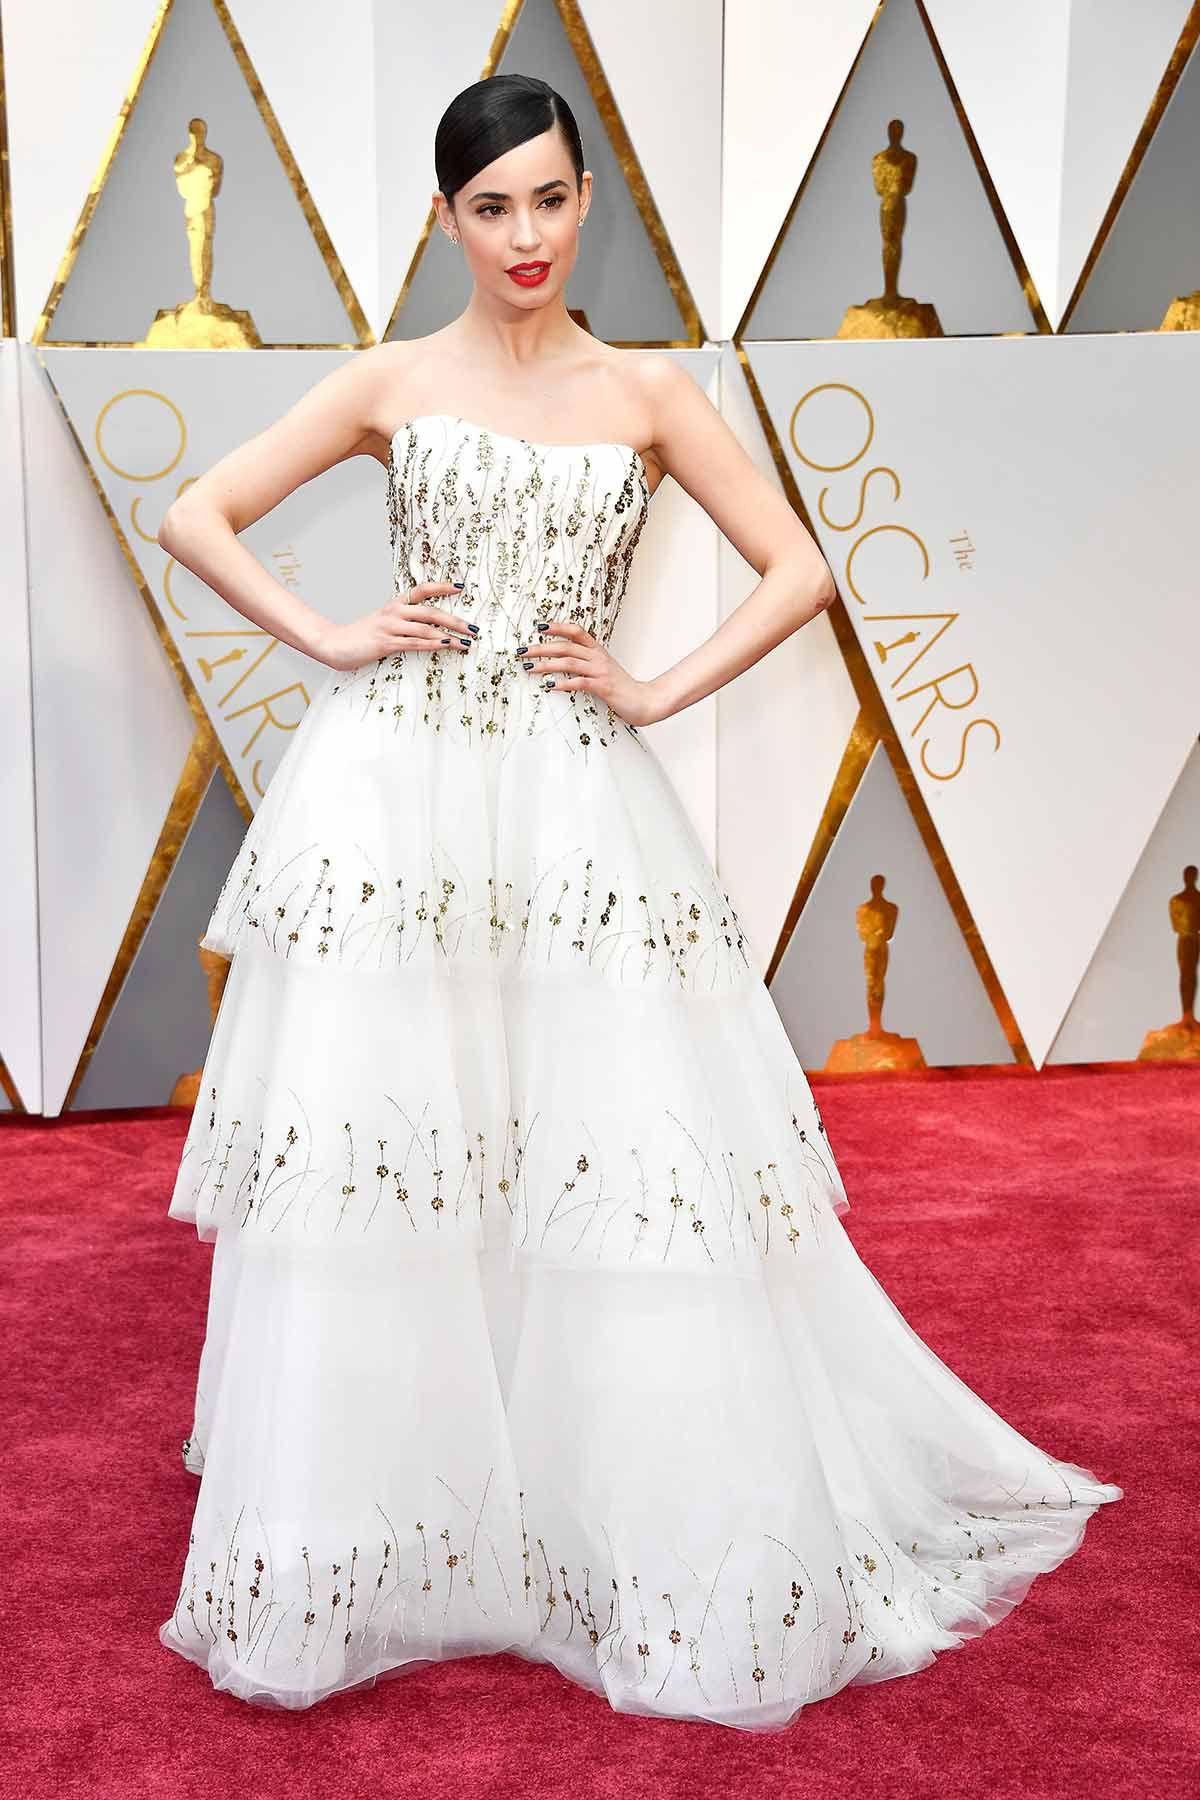 La Alfombra Roja De Los Premios Oscar 2017 Alfombra Roja Oscar Vestidos Para El Oscar Moda De Alfombra Roja